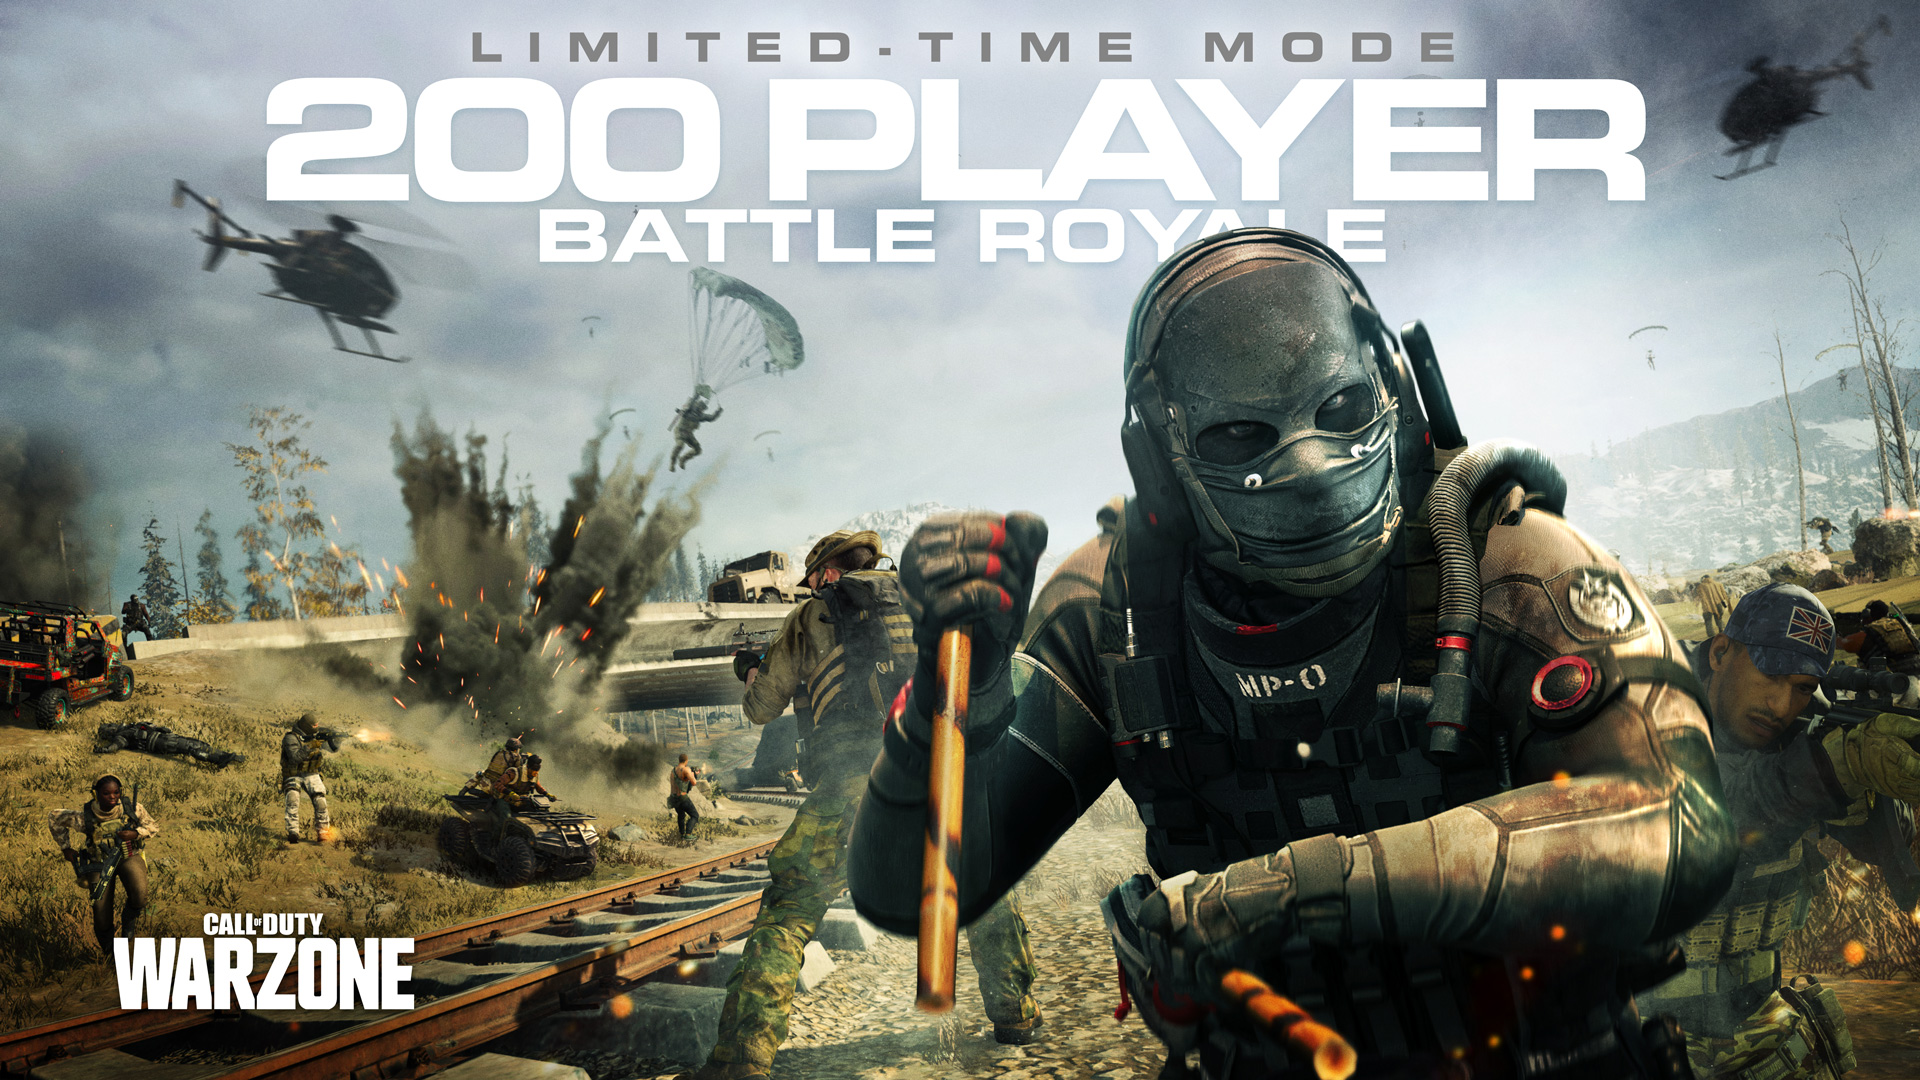 Warzone 200 Player Battle Royale